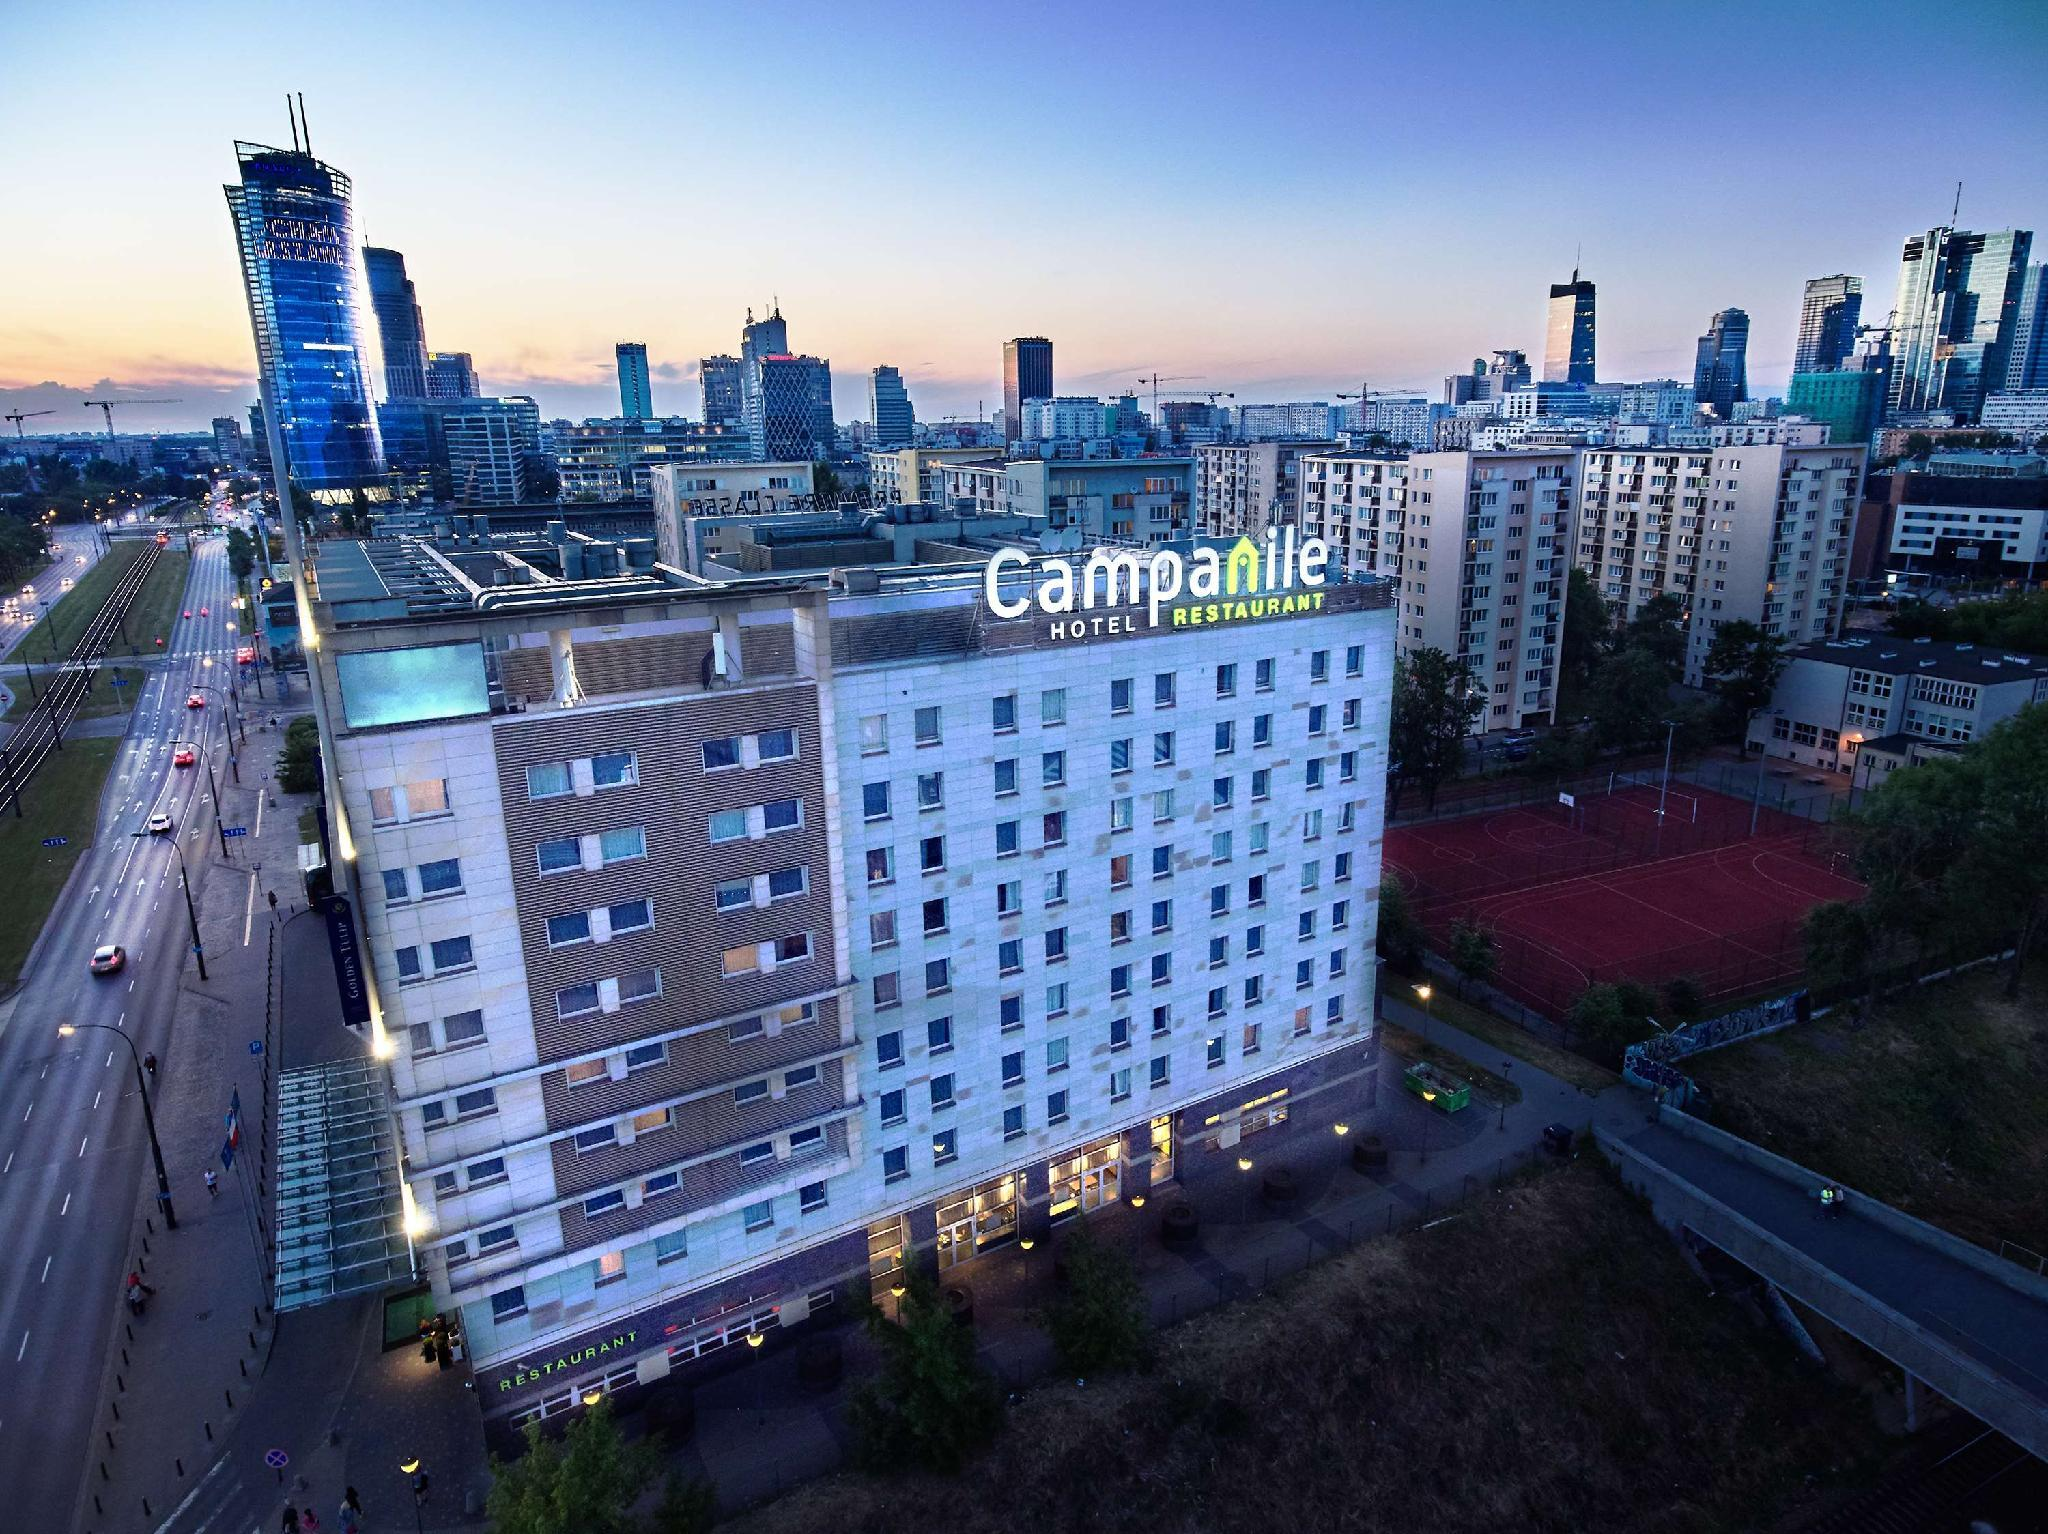 Campanile Hotel Varsovie